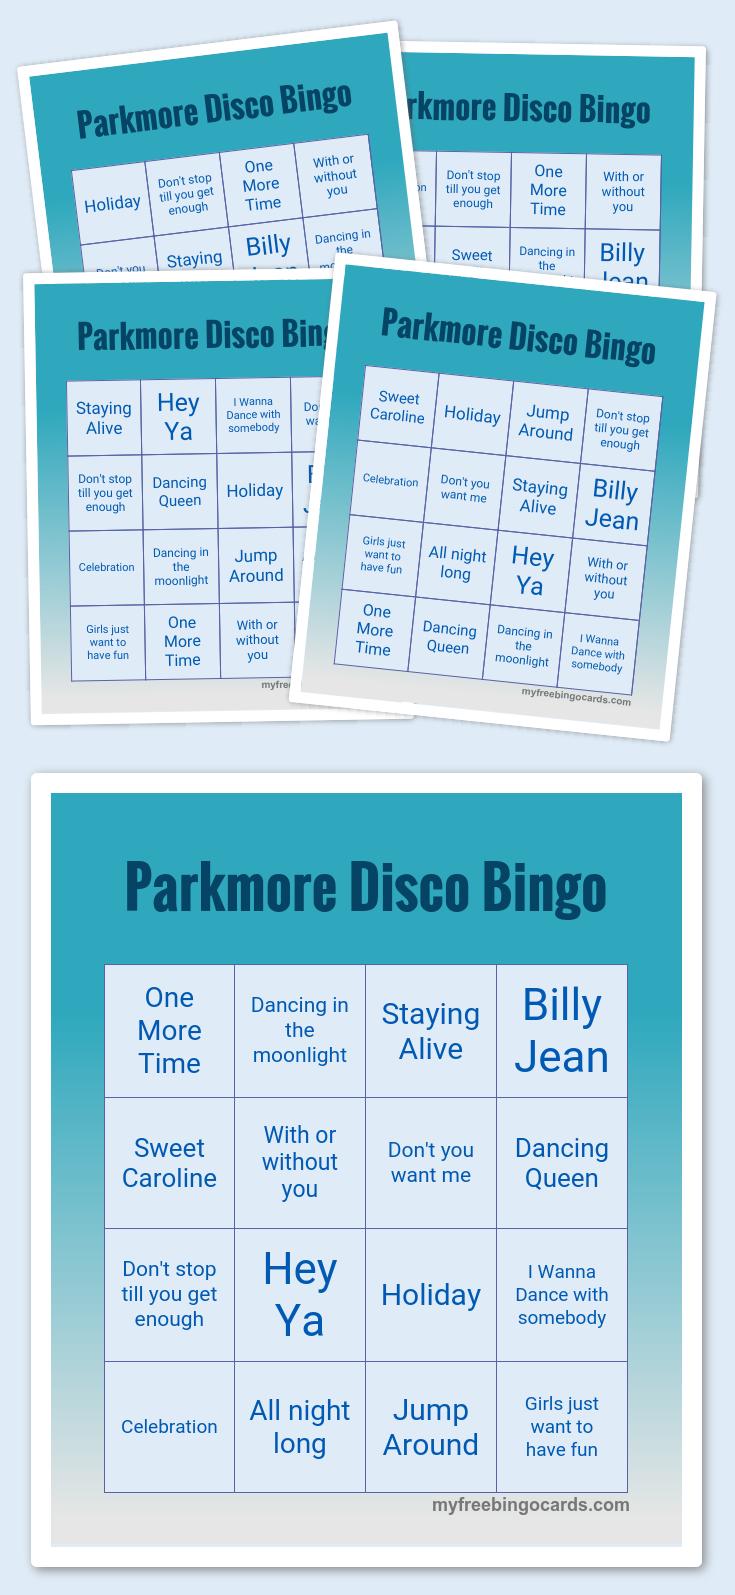 Parkmore Disco Bingo | Conference Call Bingo, Bingo Cards